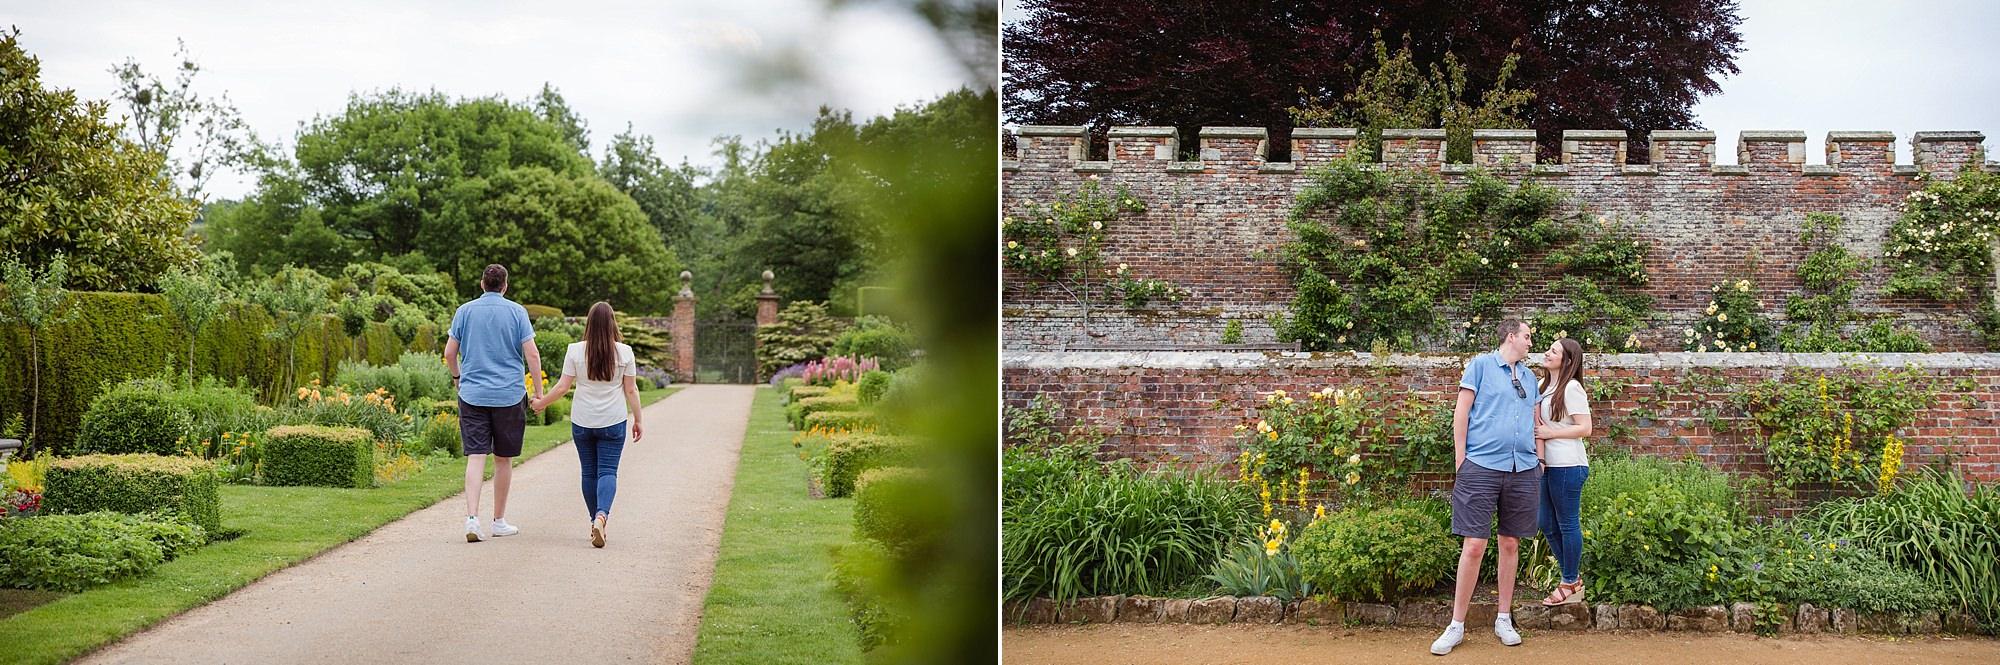 Tonbridge engagement photography couple walking through gardens